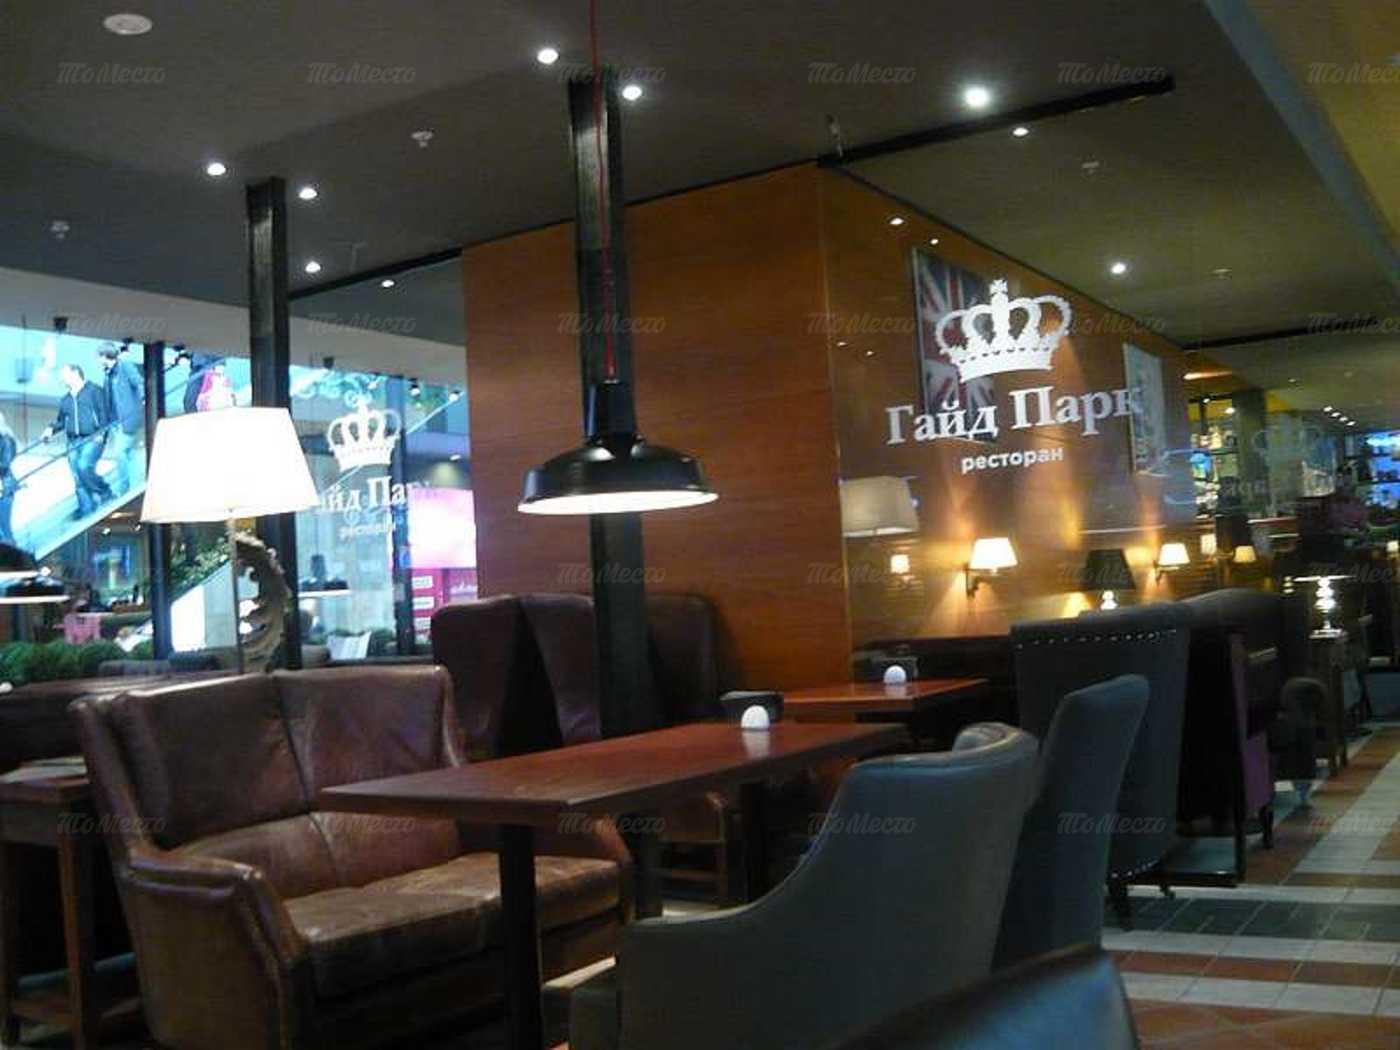 Меню ресторана Гайд парк на проспекте Михаила Нагибина